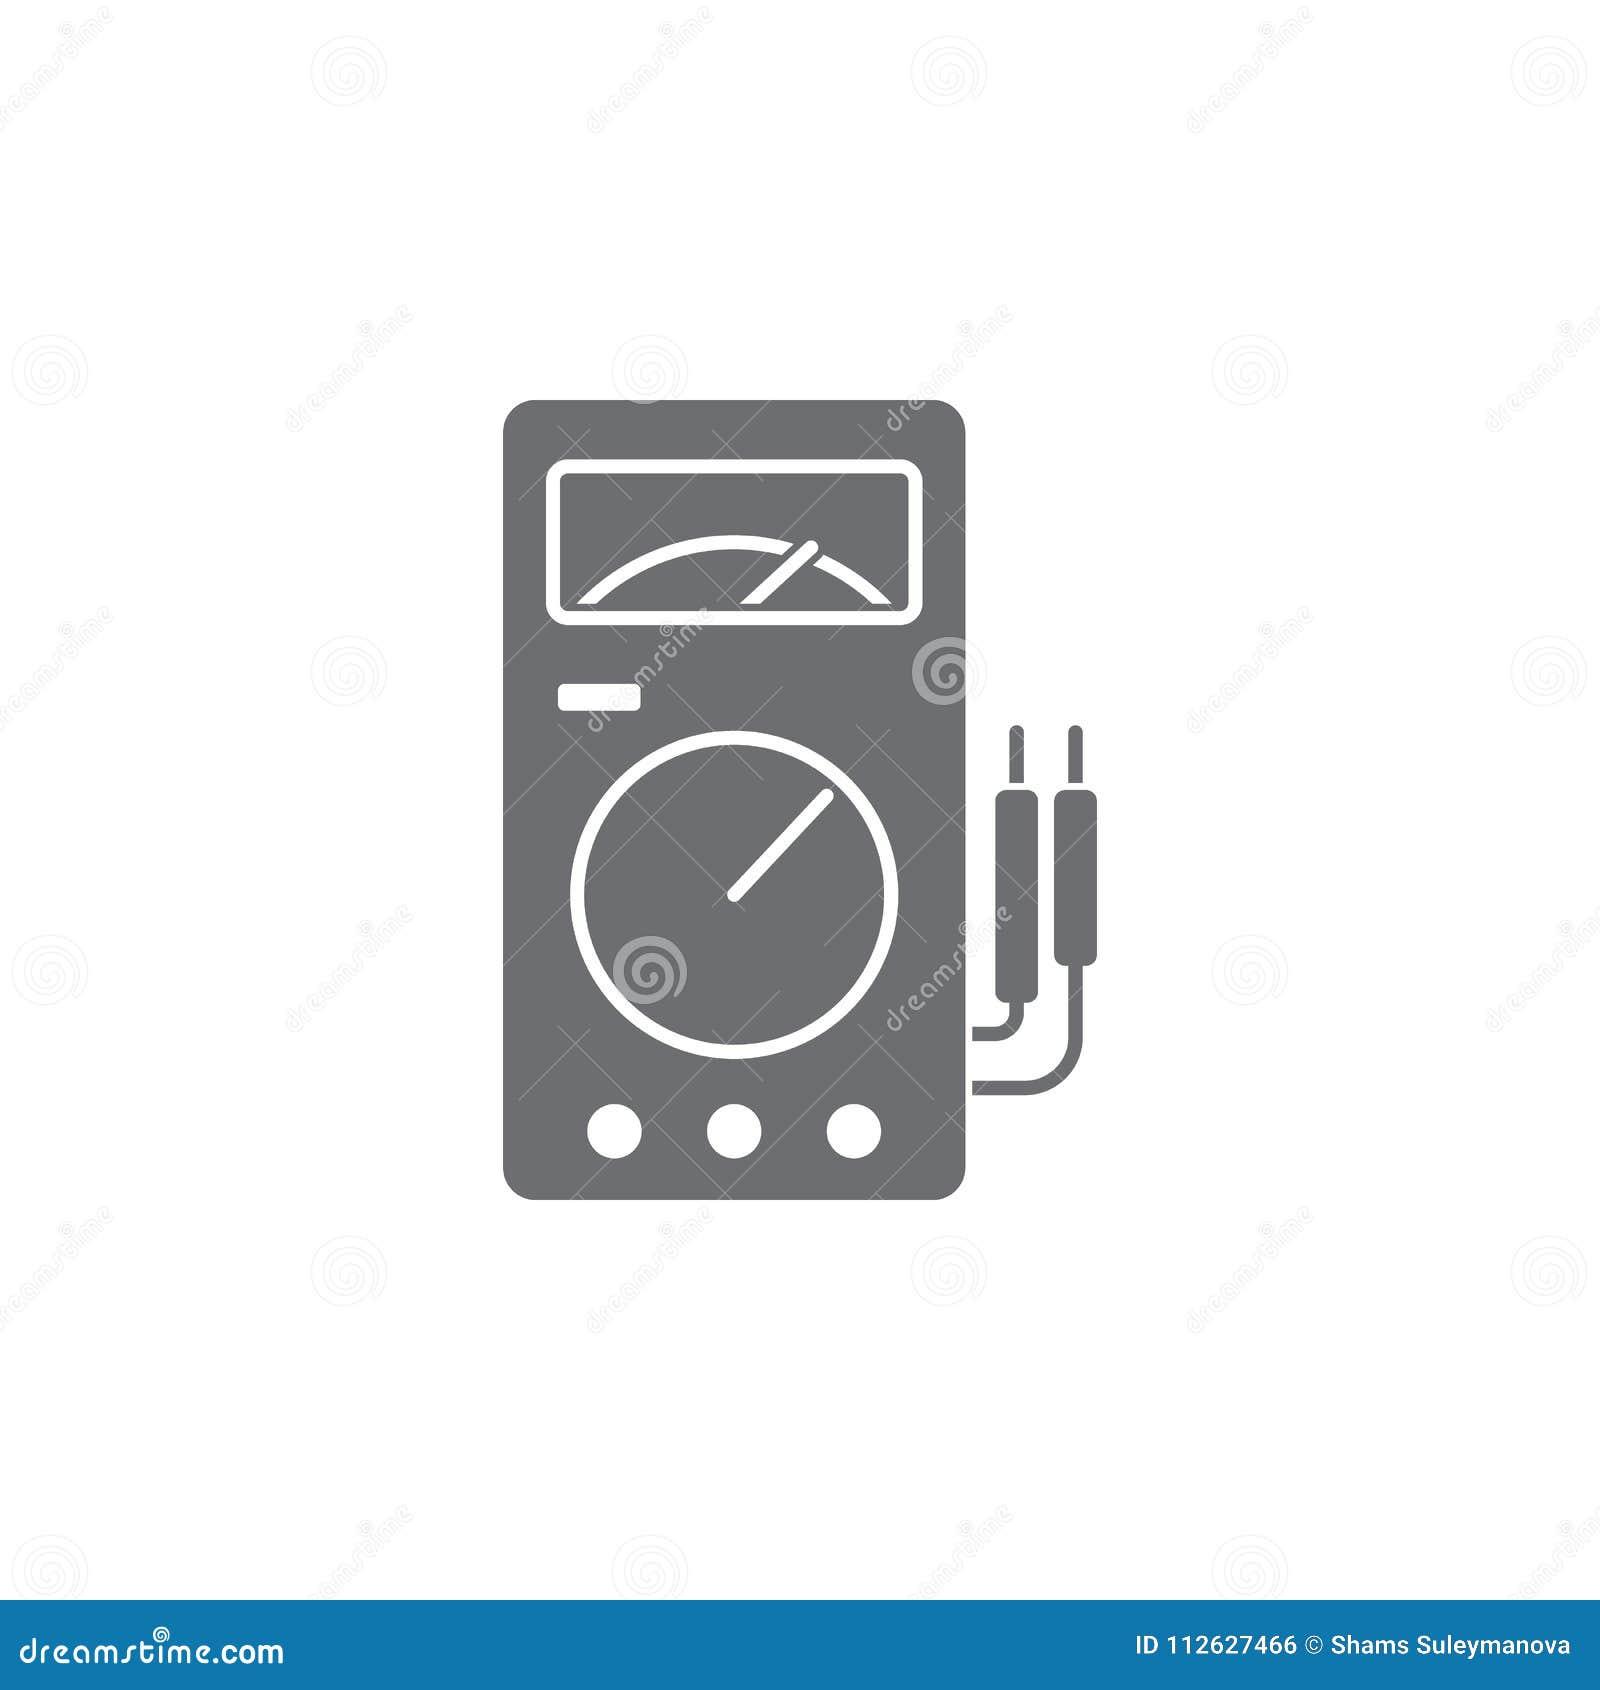 Niedlich Voltmeter Symbole Fotos - Verdrahtungsideen - korsmi.info